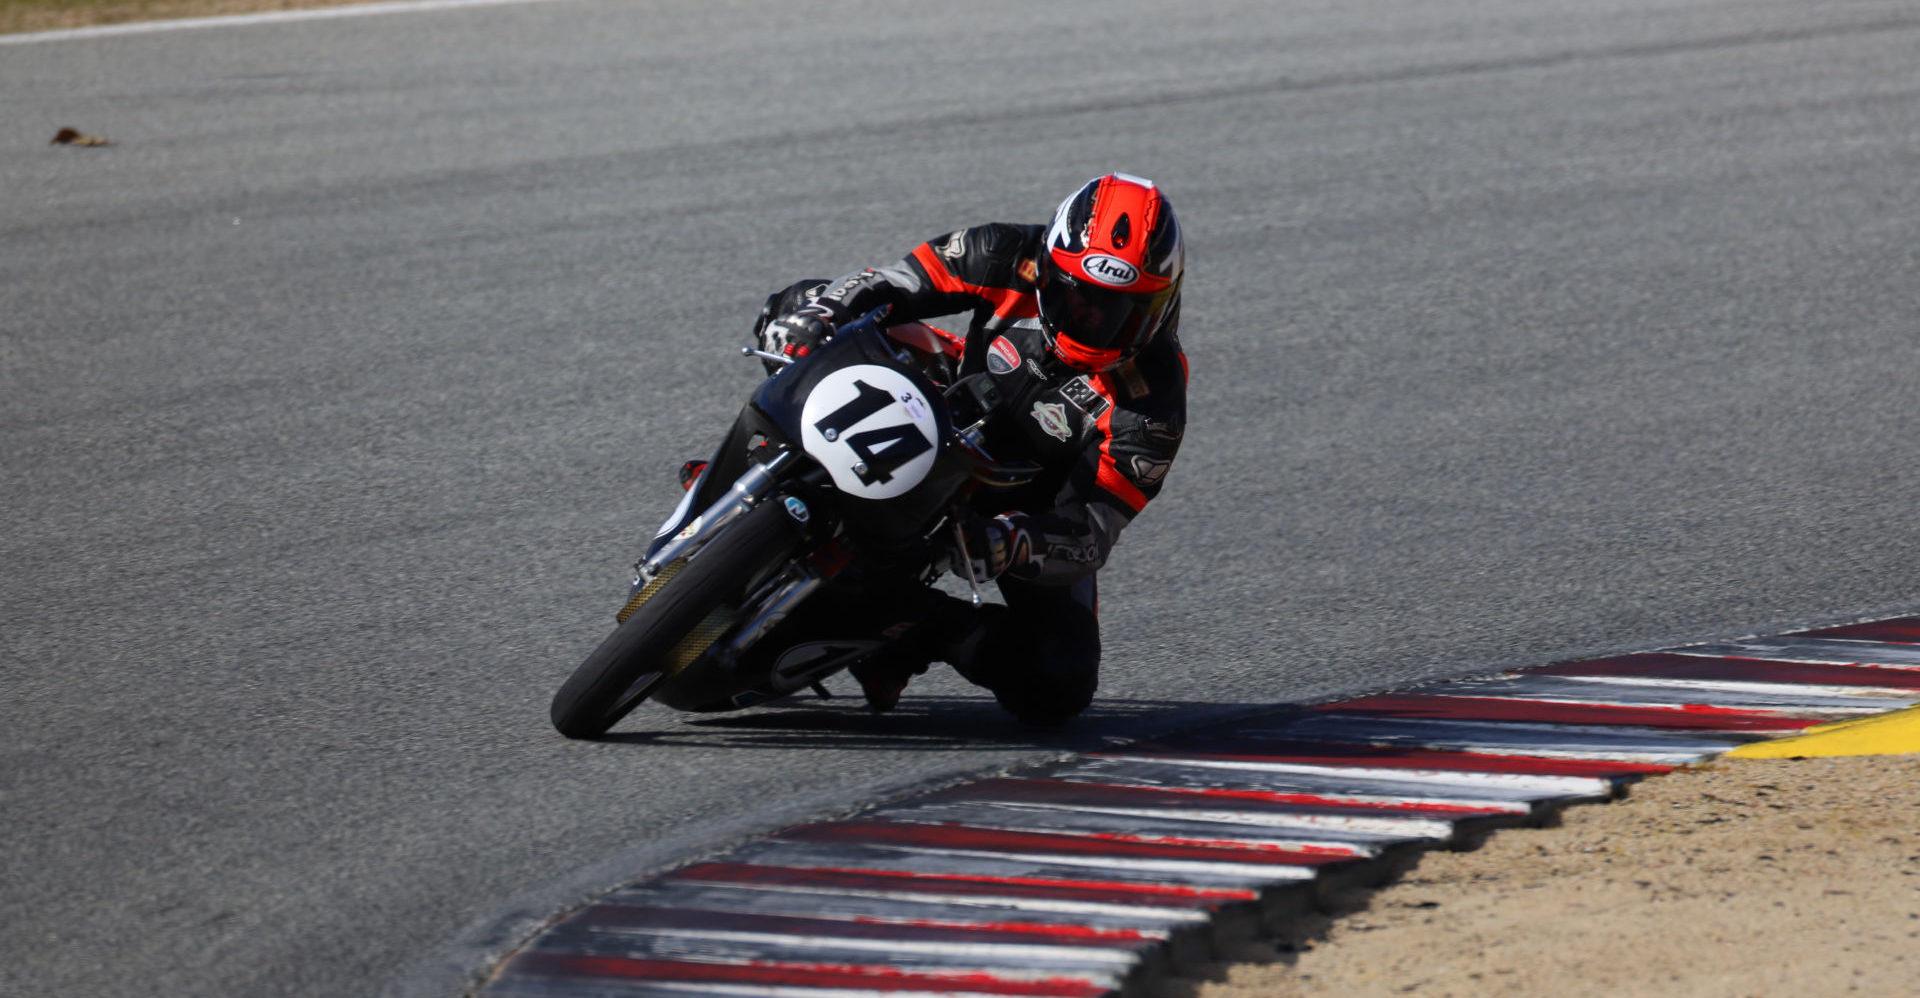 Brian Larrabure (14). Photo by etechphoto.com, courtesy of AHRMA.